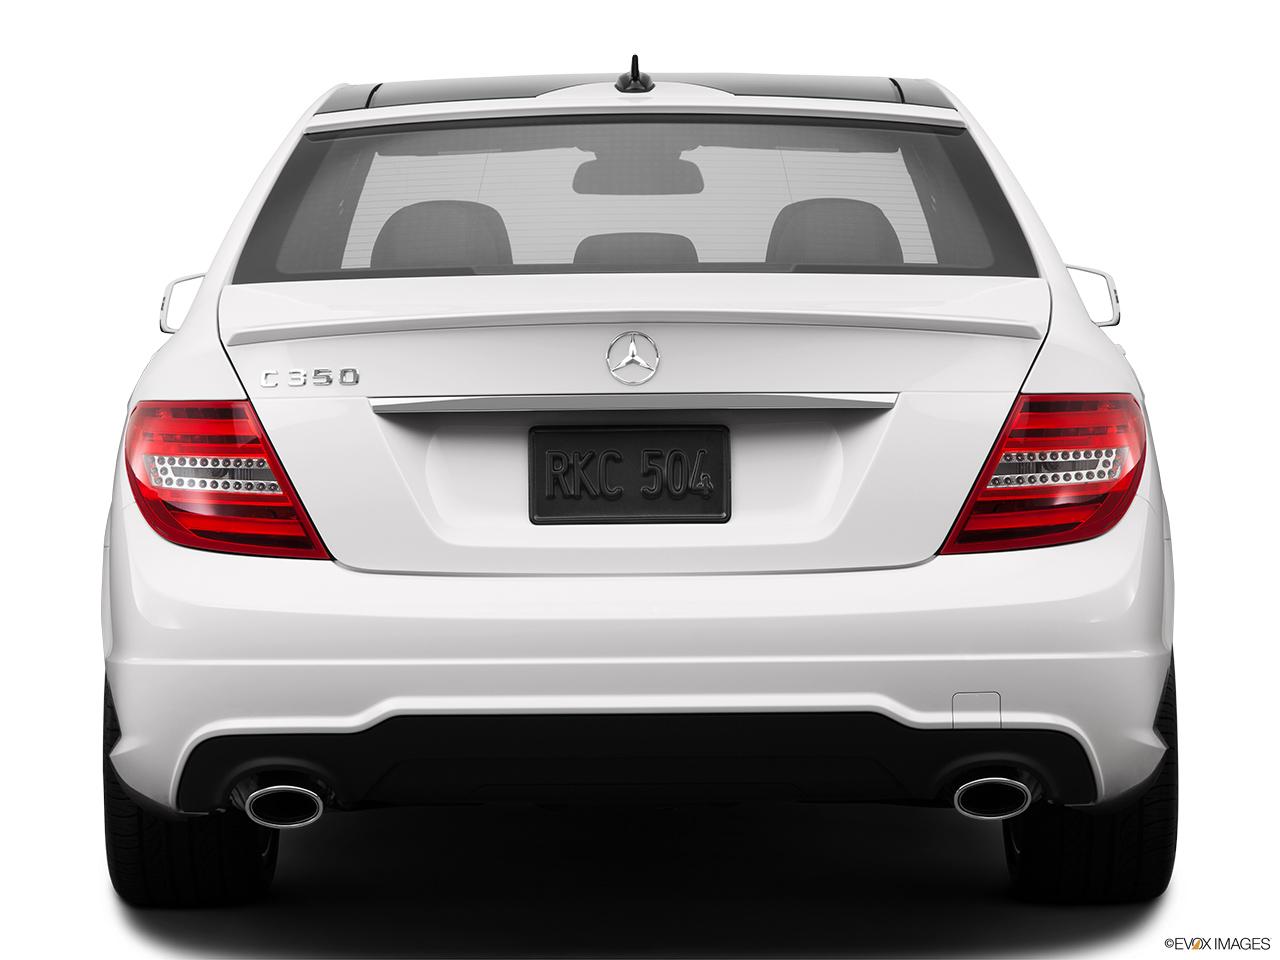 2014 moreover 2413631 additionally 2019 Audi Q7 Interior moreover Mercedes E Class E350 Cdi Estate moreover 364671 Dash Layout 1967 W111. on 2010 mercedes e350 sport